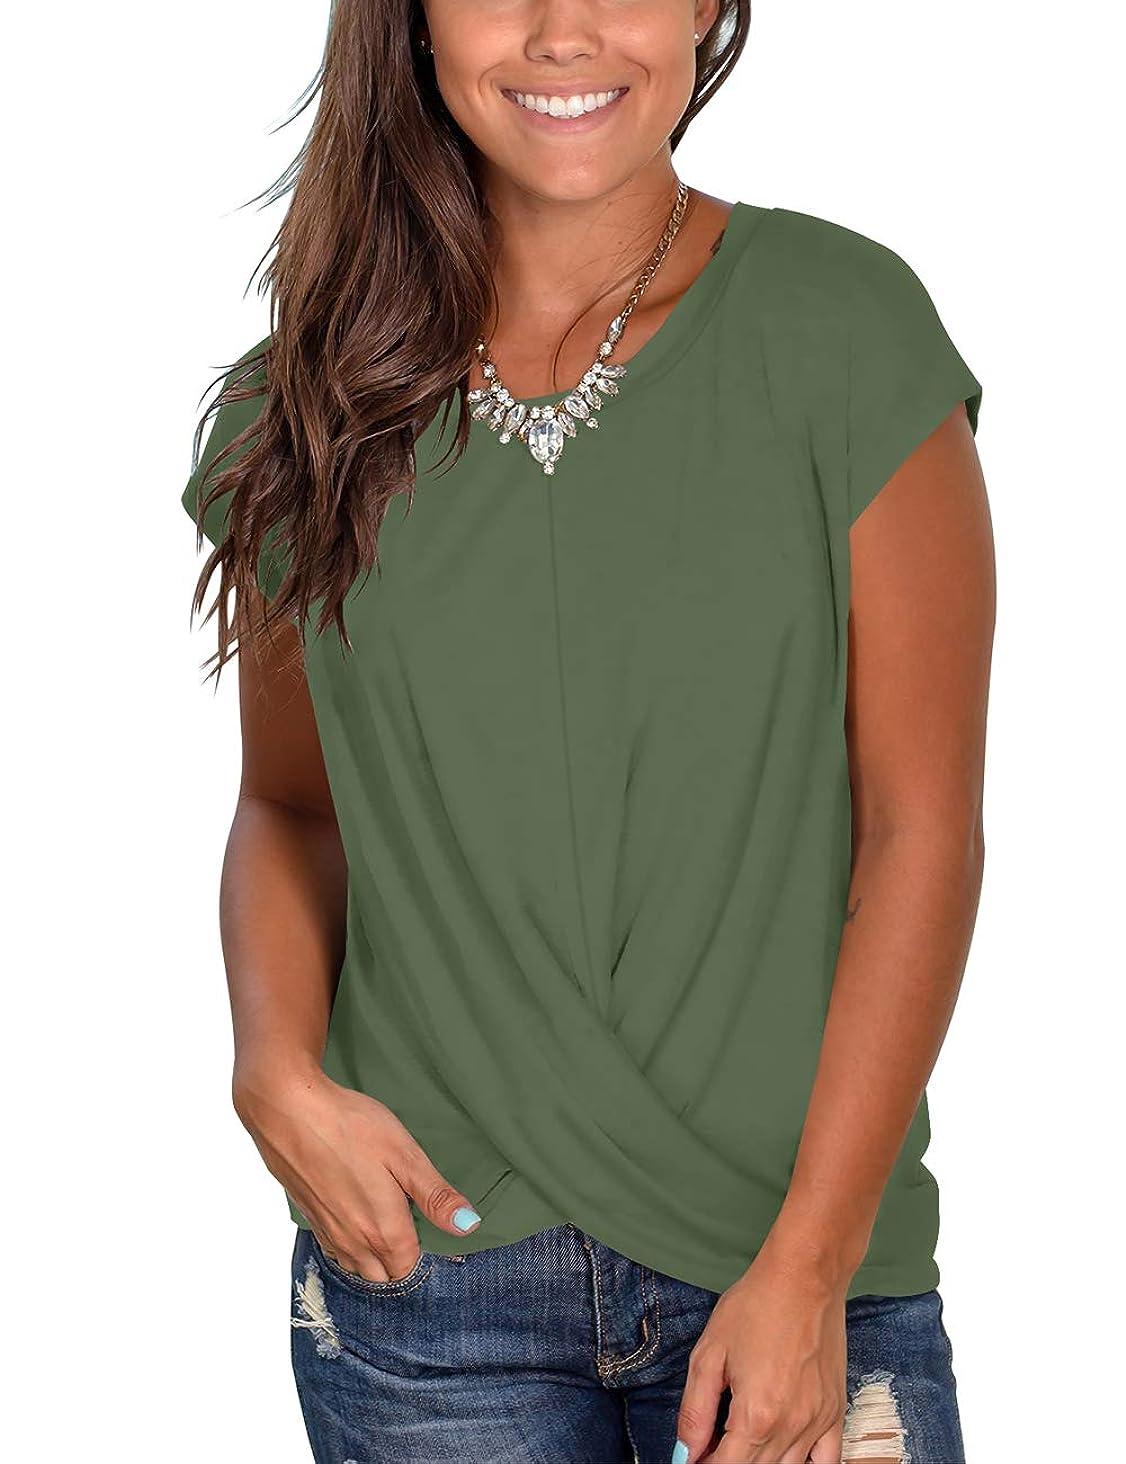 Womens Tassel Short Sleeve Round Neck T-Shirt Top Casual Summer Tee